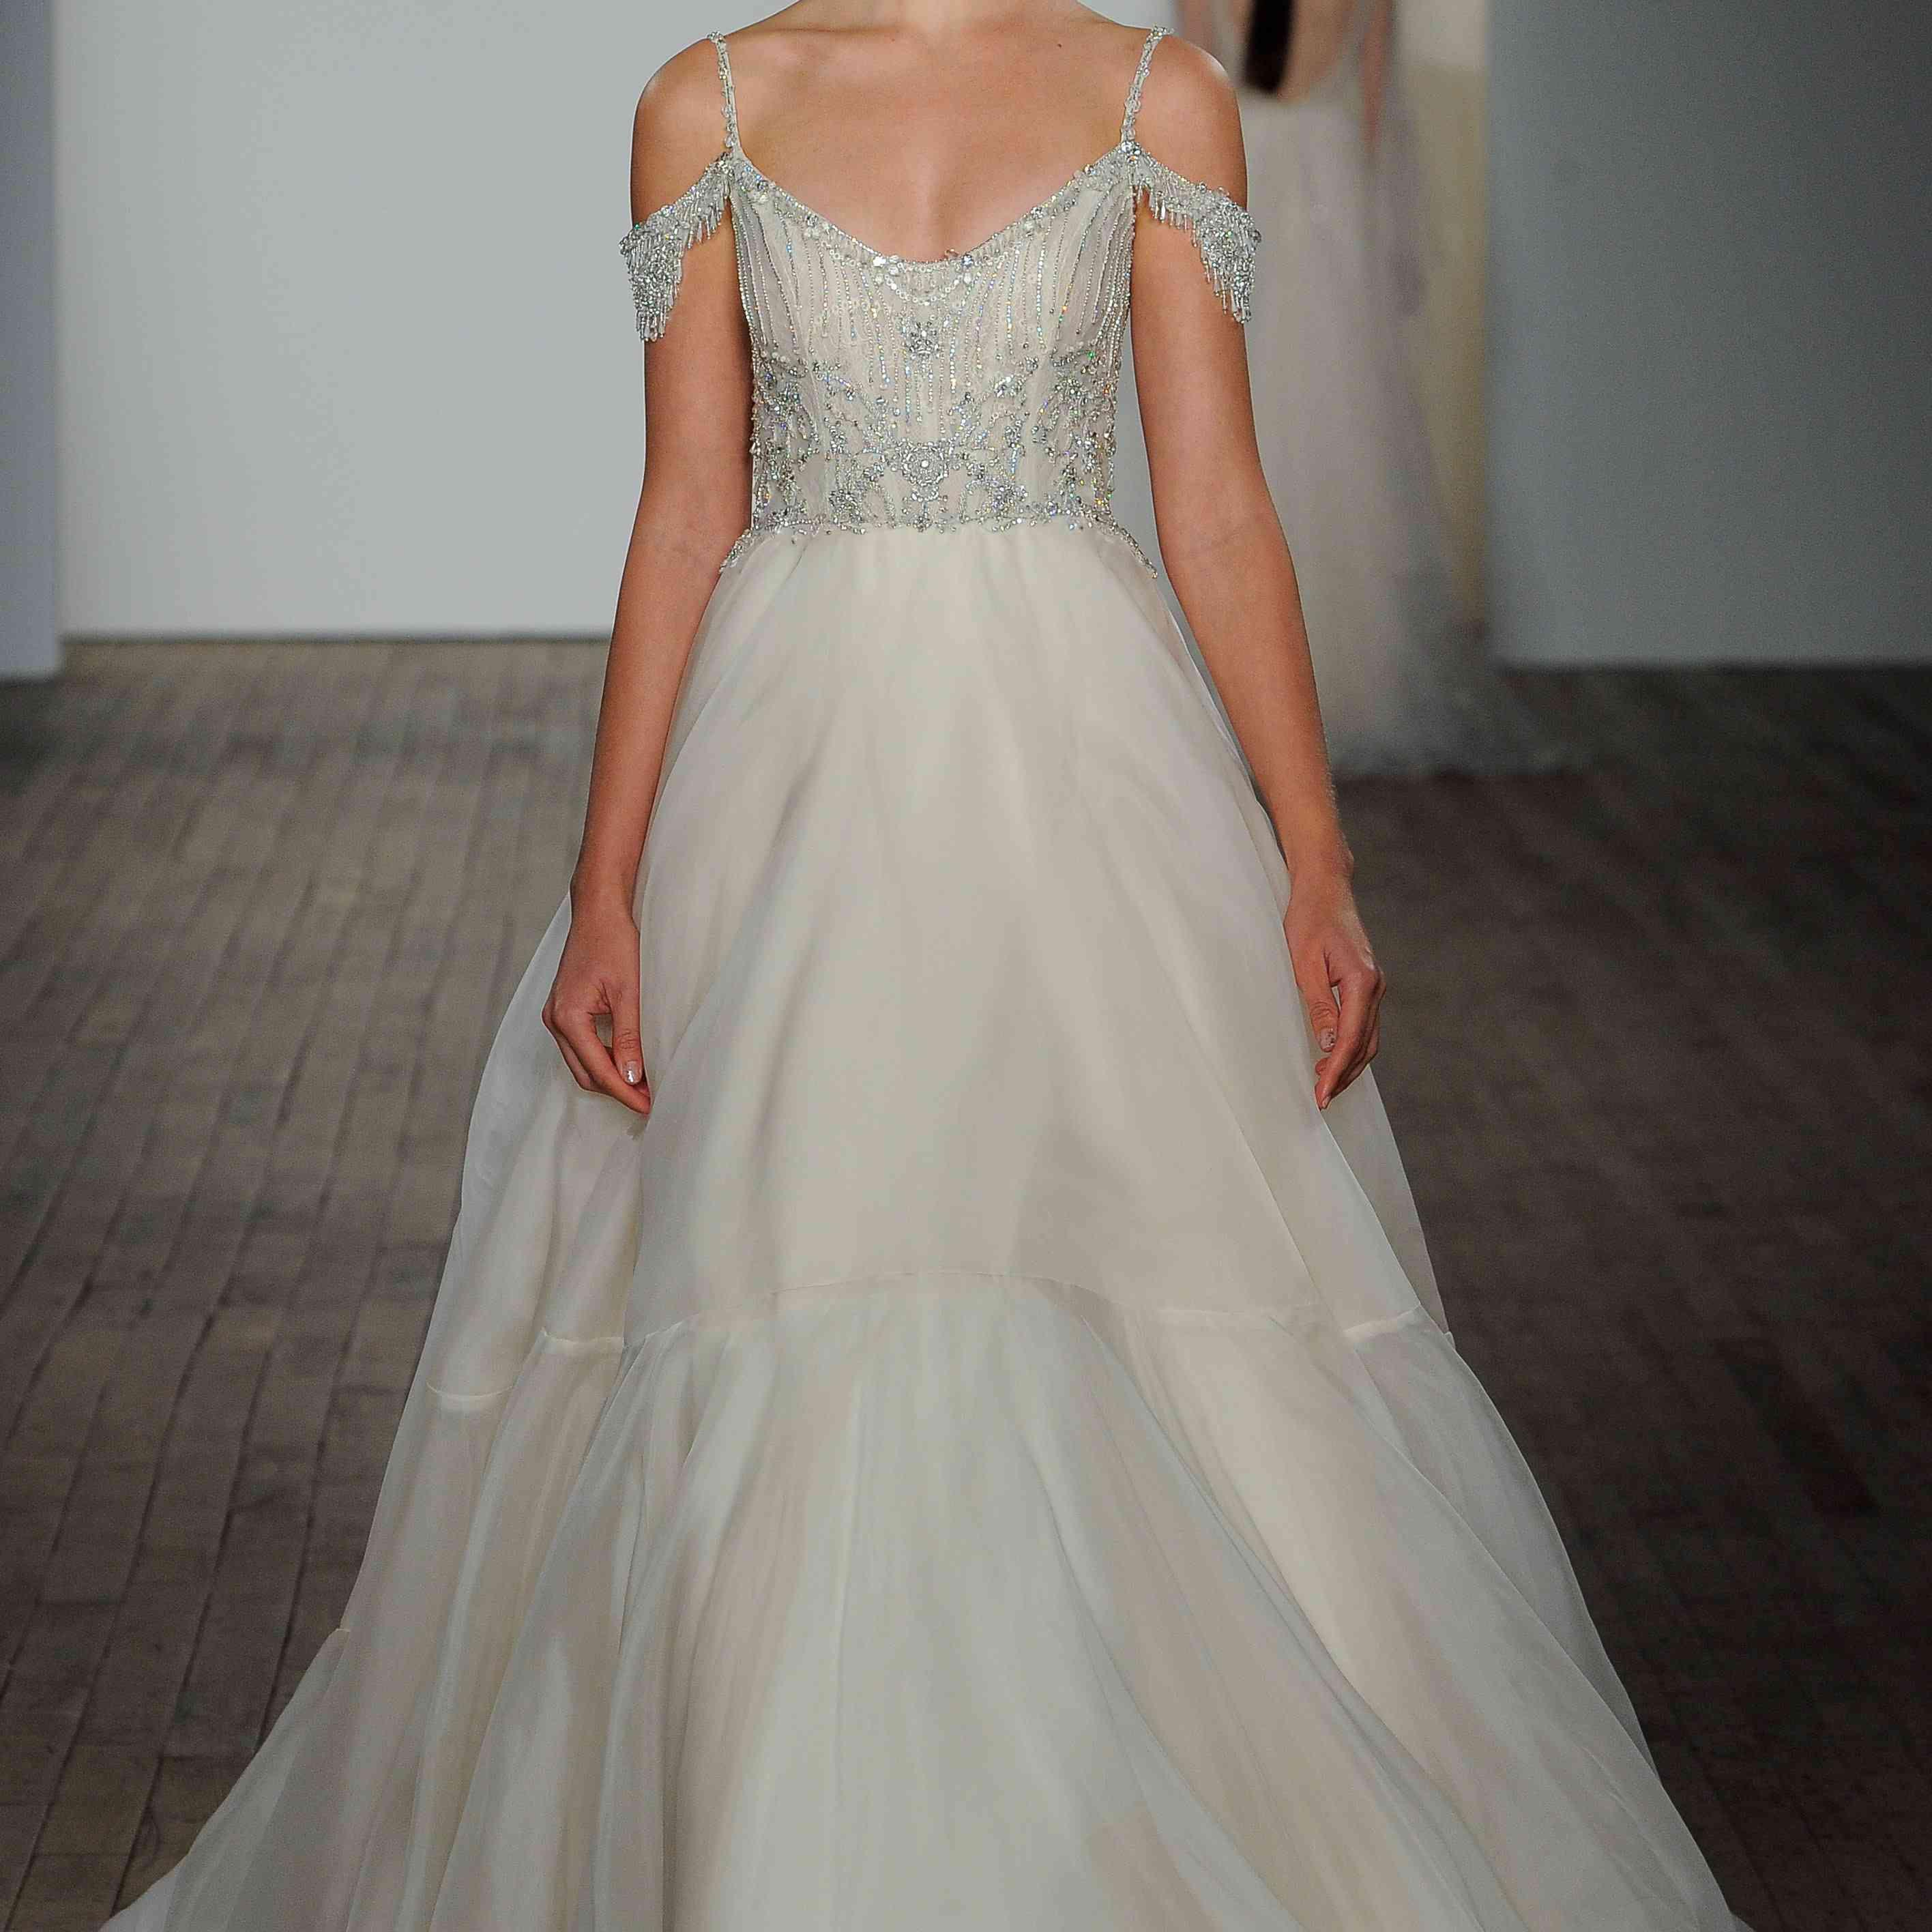 Juliet off-the-shoulder wedding dress lazaro